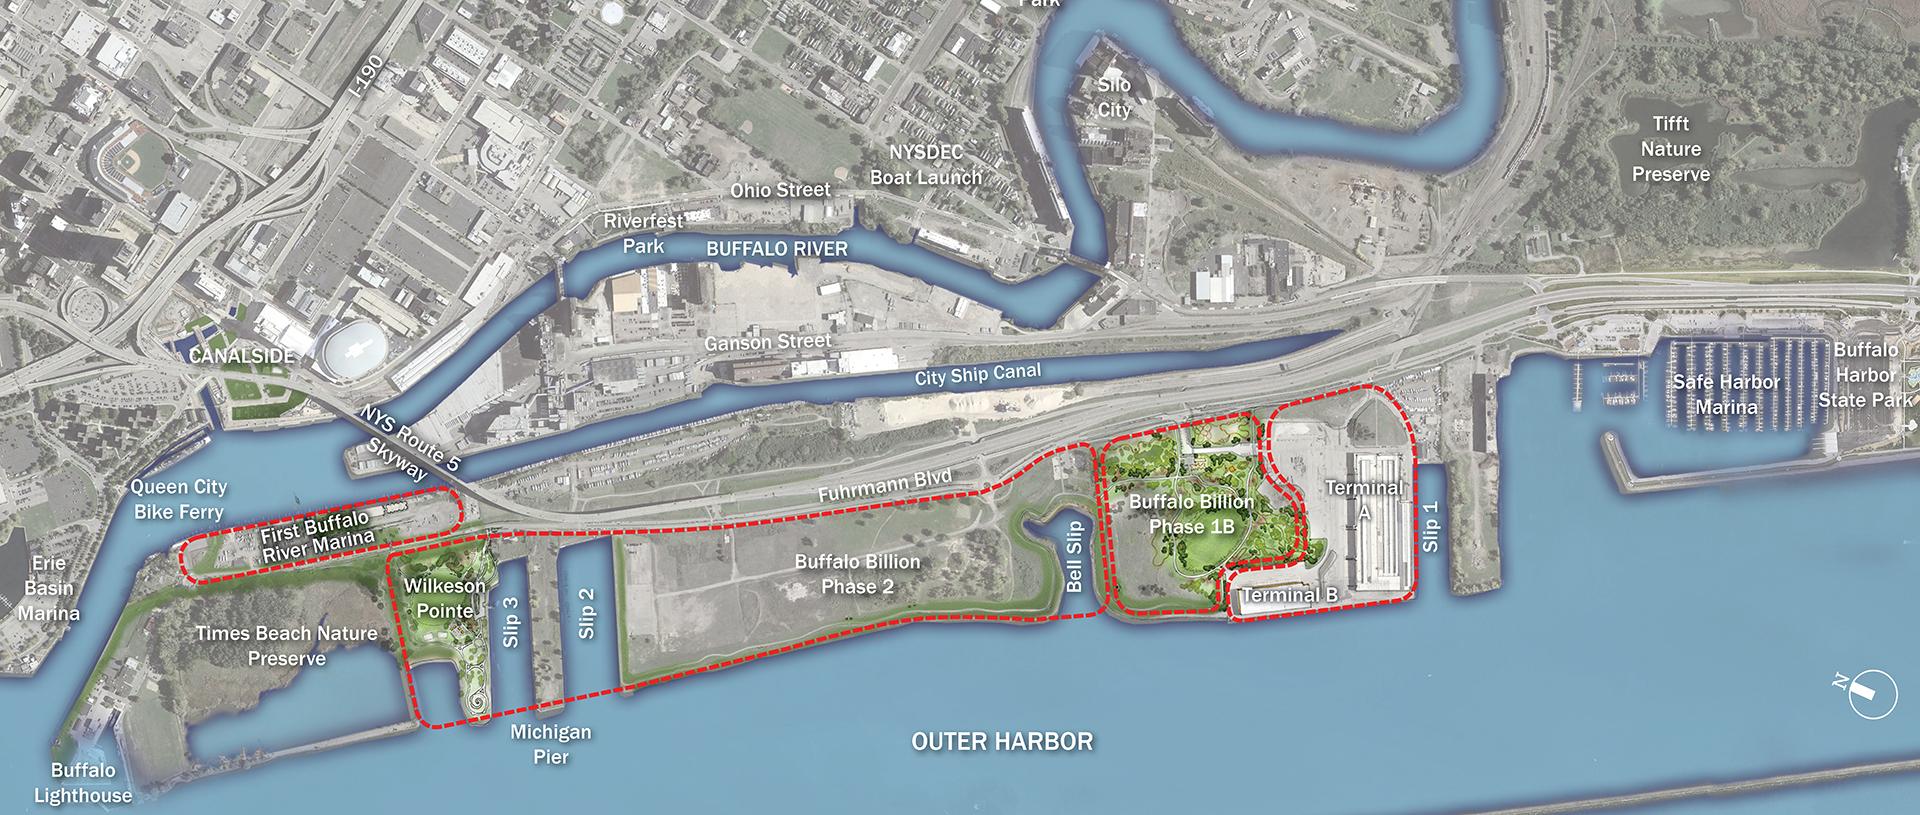 Image courtesy Erie Canal Harbor Development Corporation.